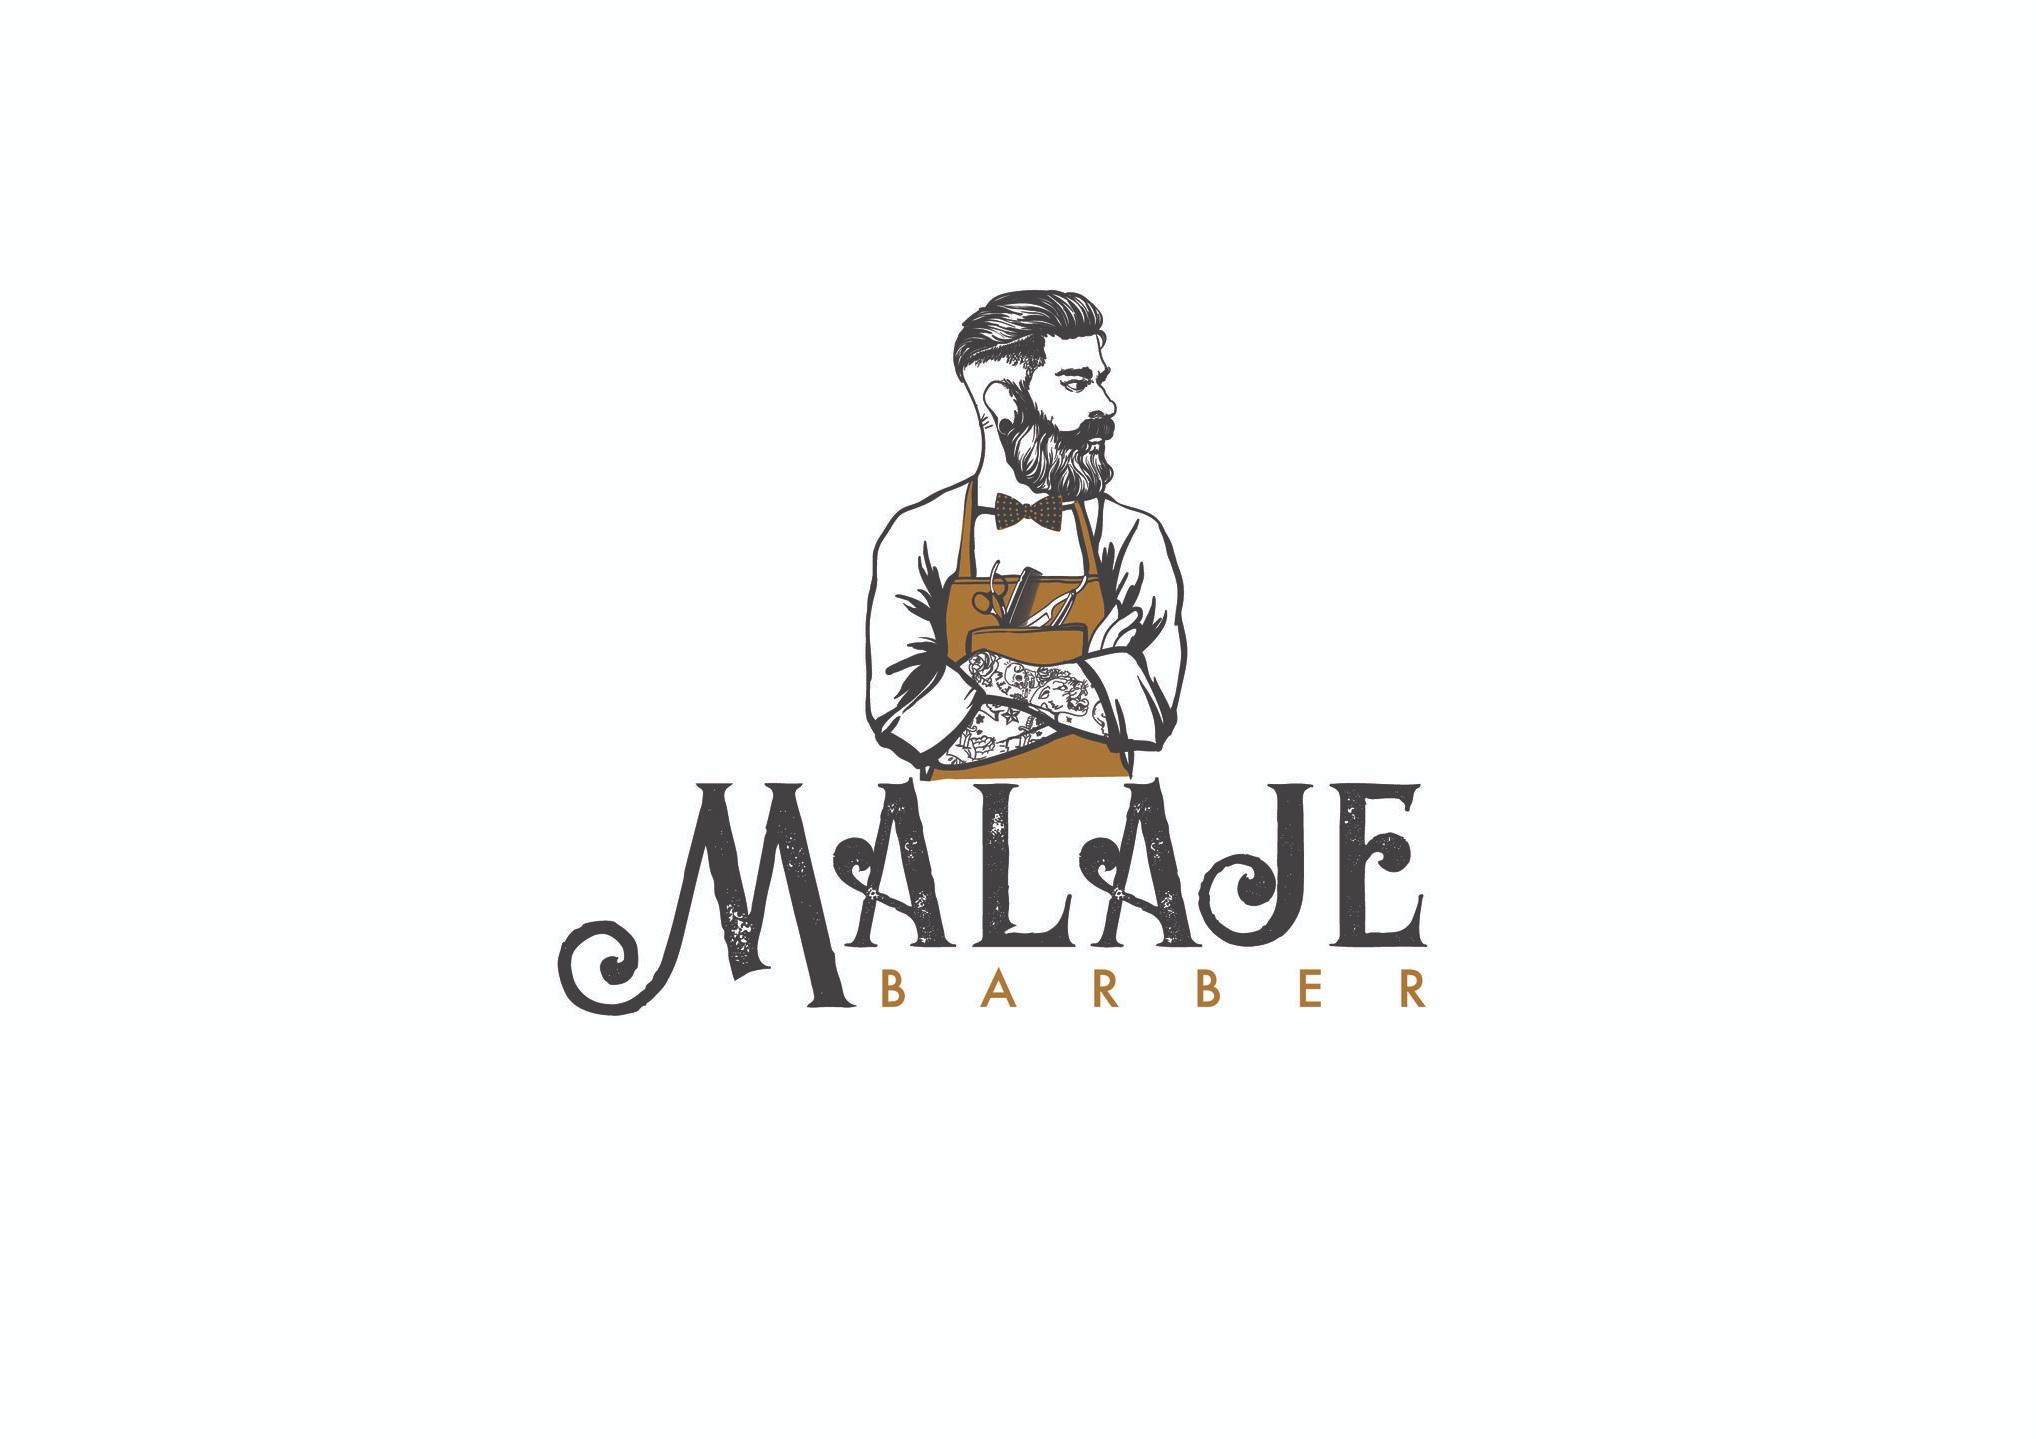 logotipo-malajebarber-malajetime-02.jpg